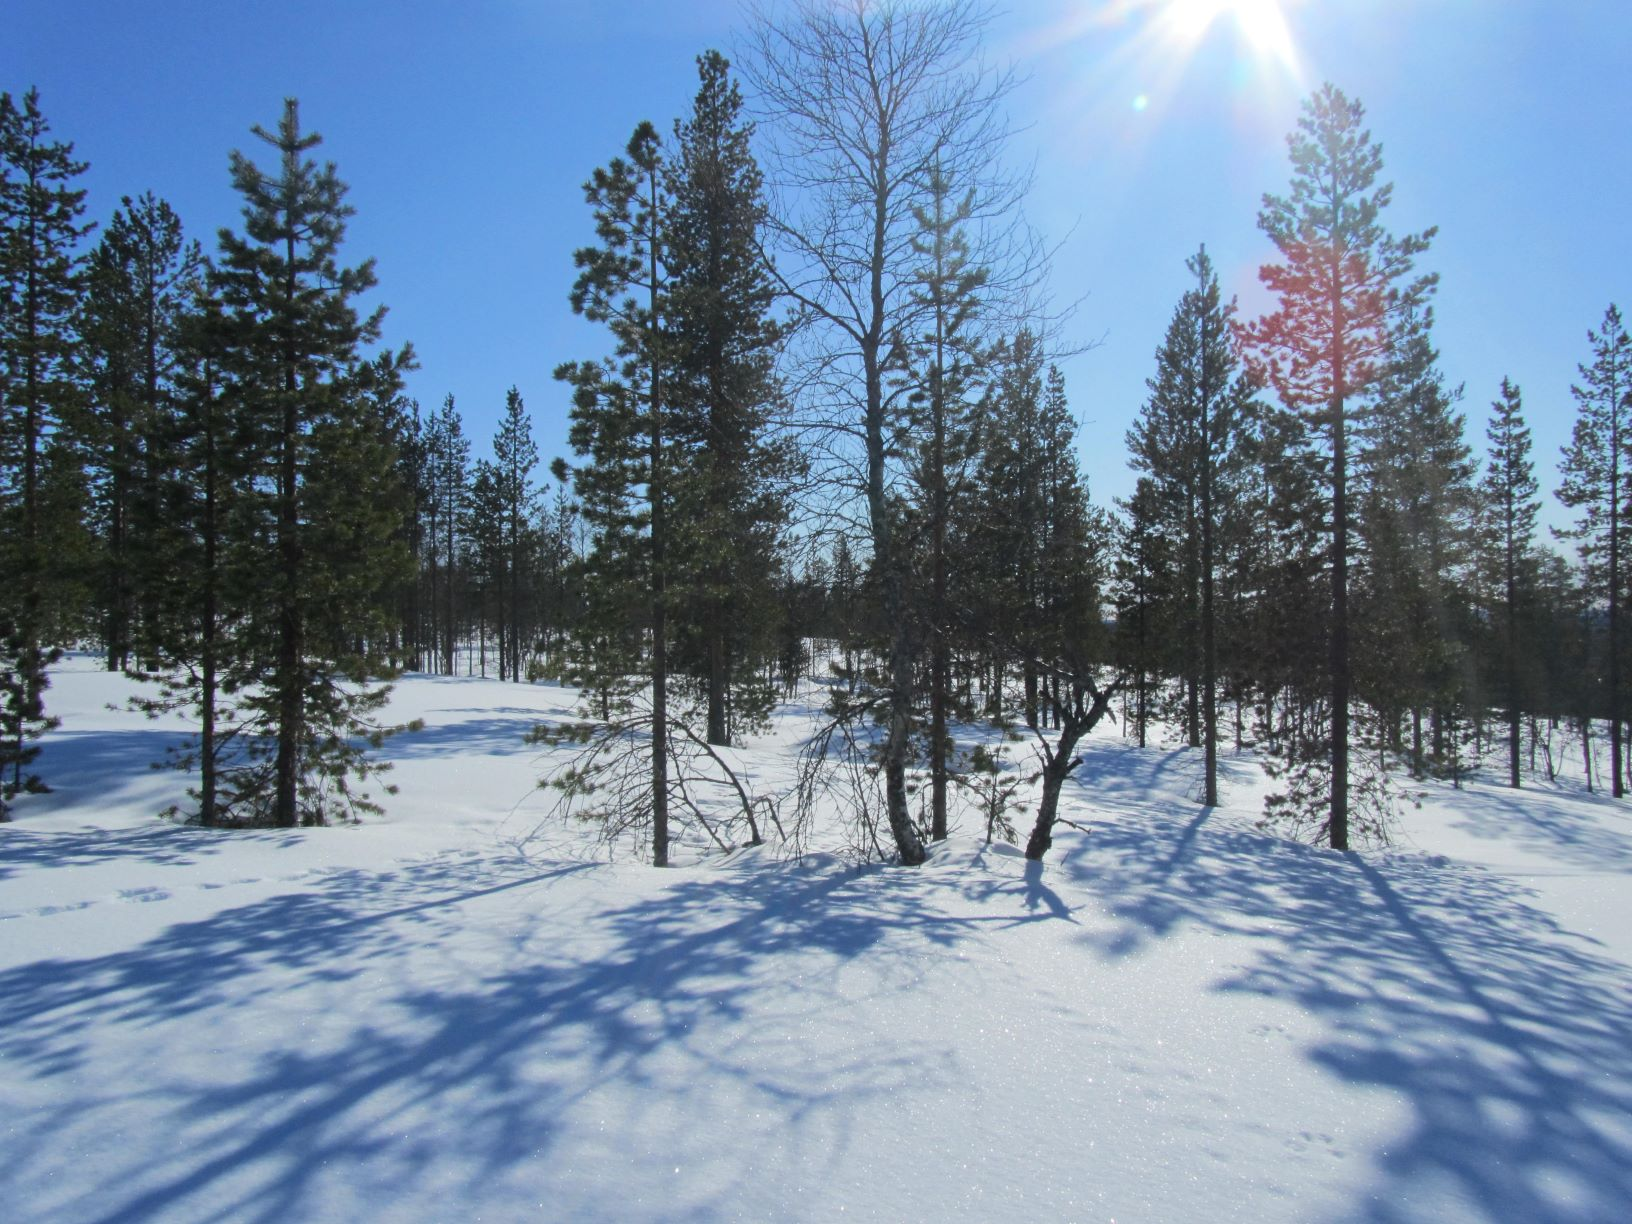 Winter highlights in Finland